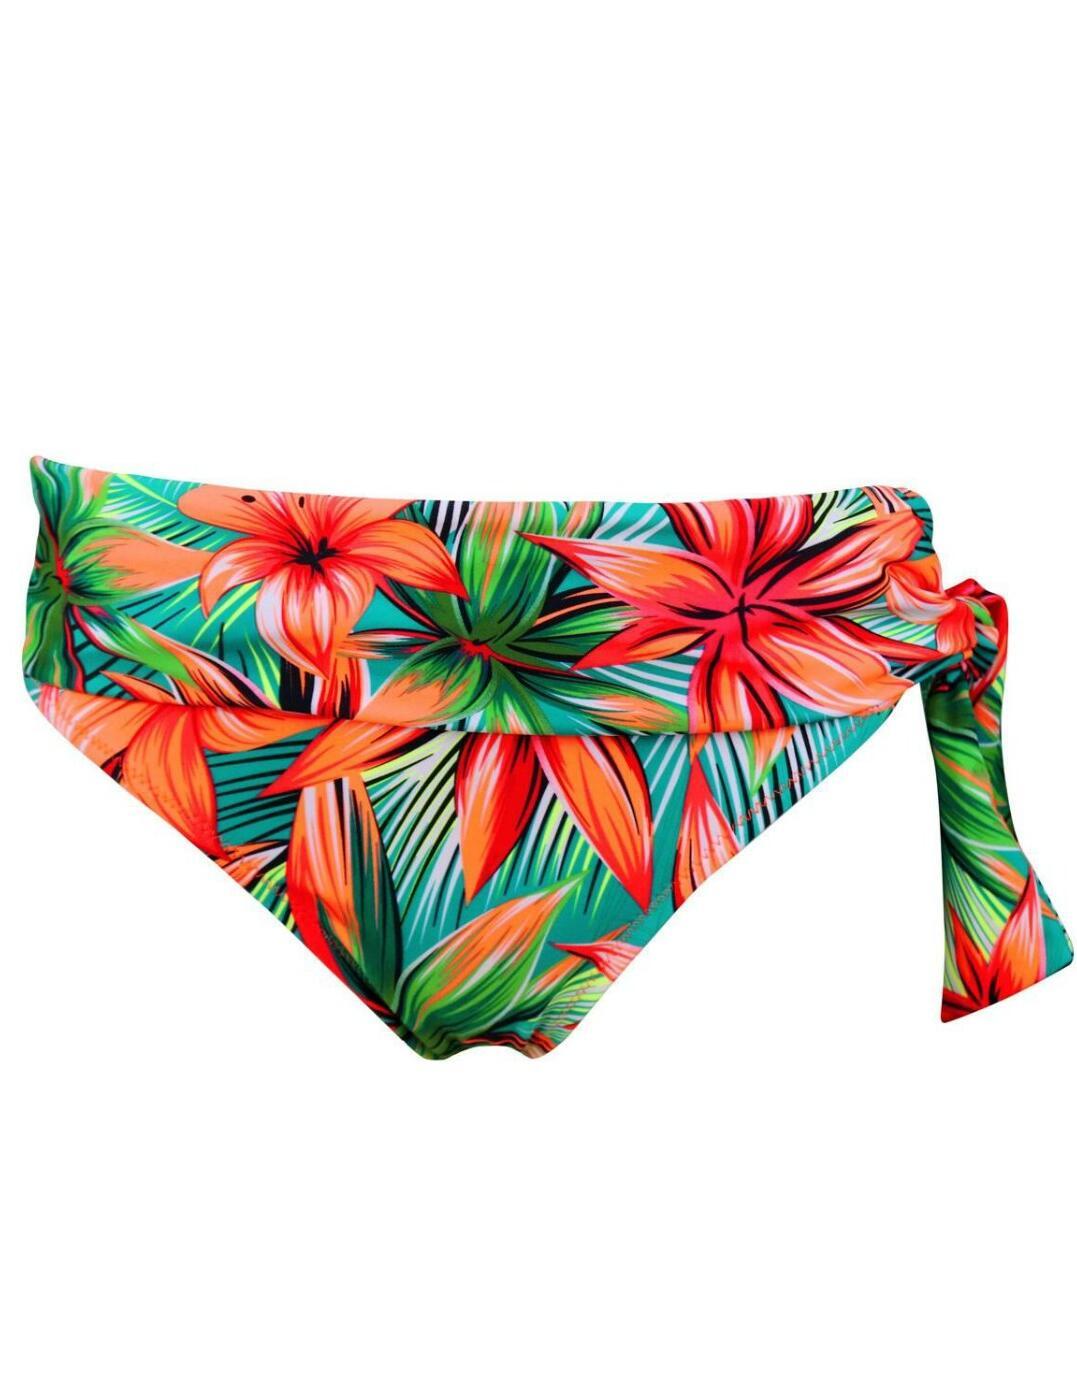 Pour-Moi-Heatwave-Fold-Over-Bikini-Brief-Bottoms-86003-New-Womens-Swimwear thumbnail 9